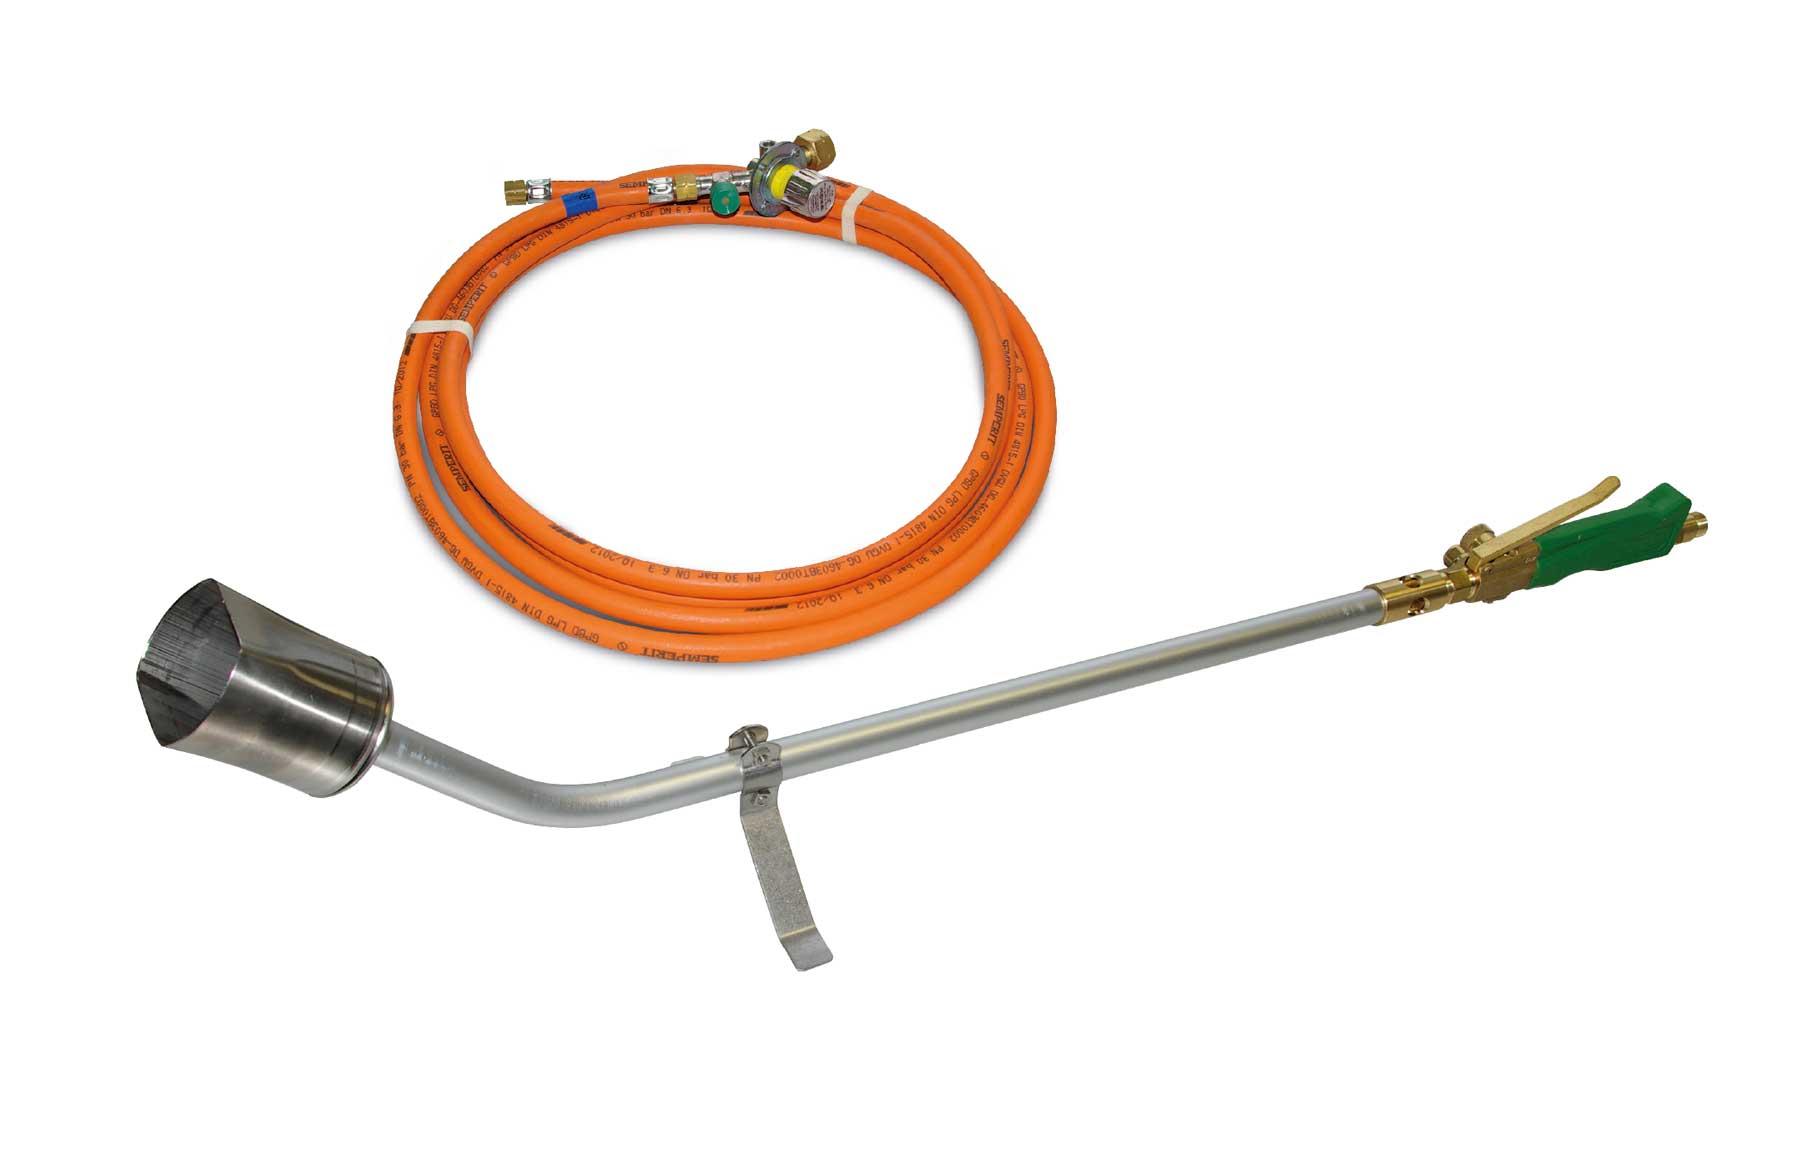 Propan-Leisebrenner LB 120 Set / Propane silent burner LB 120 set